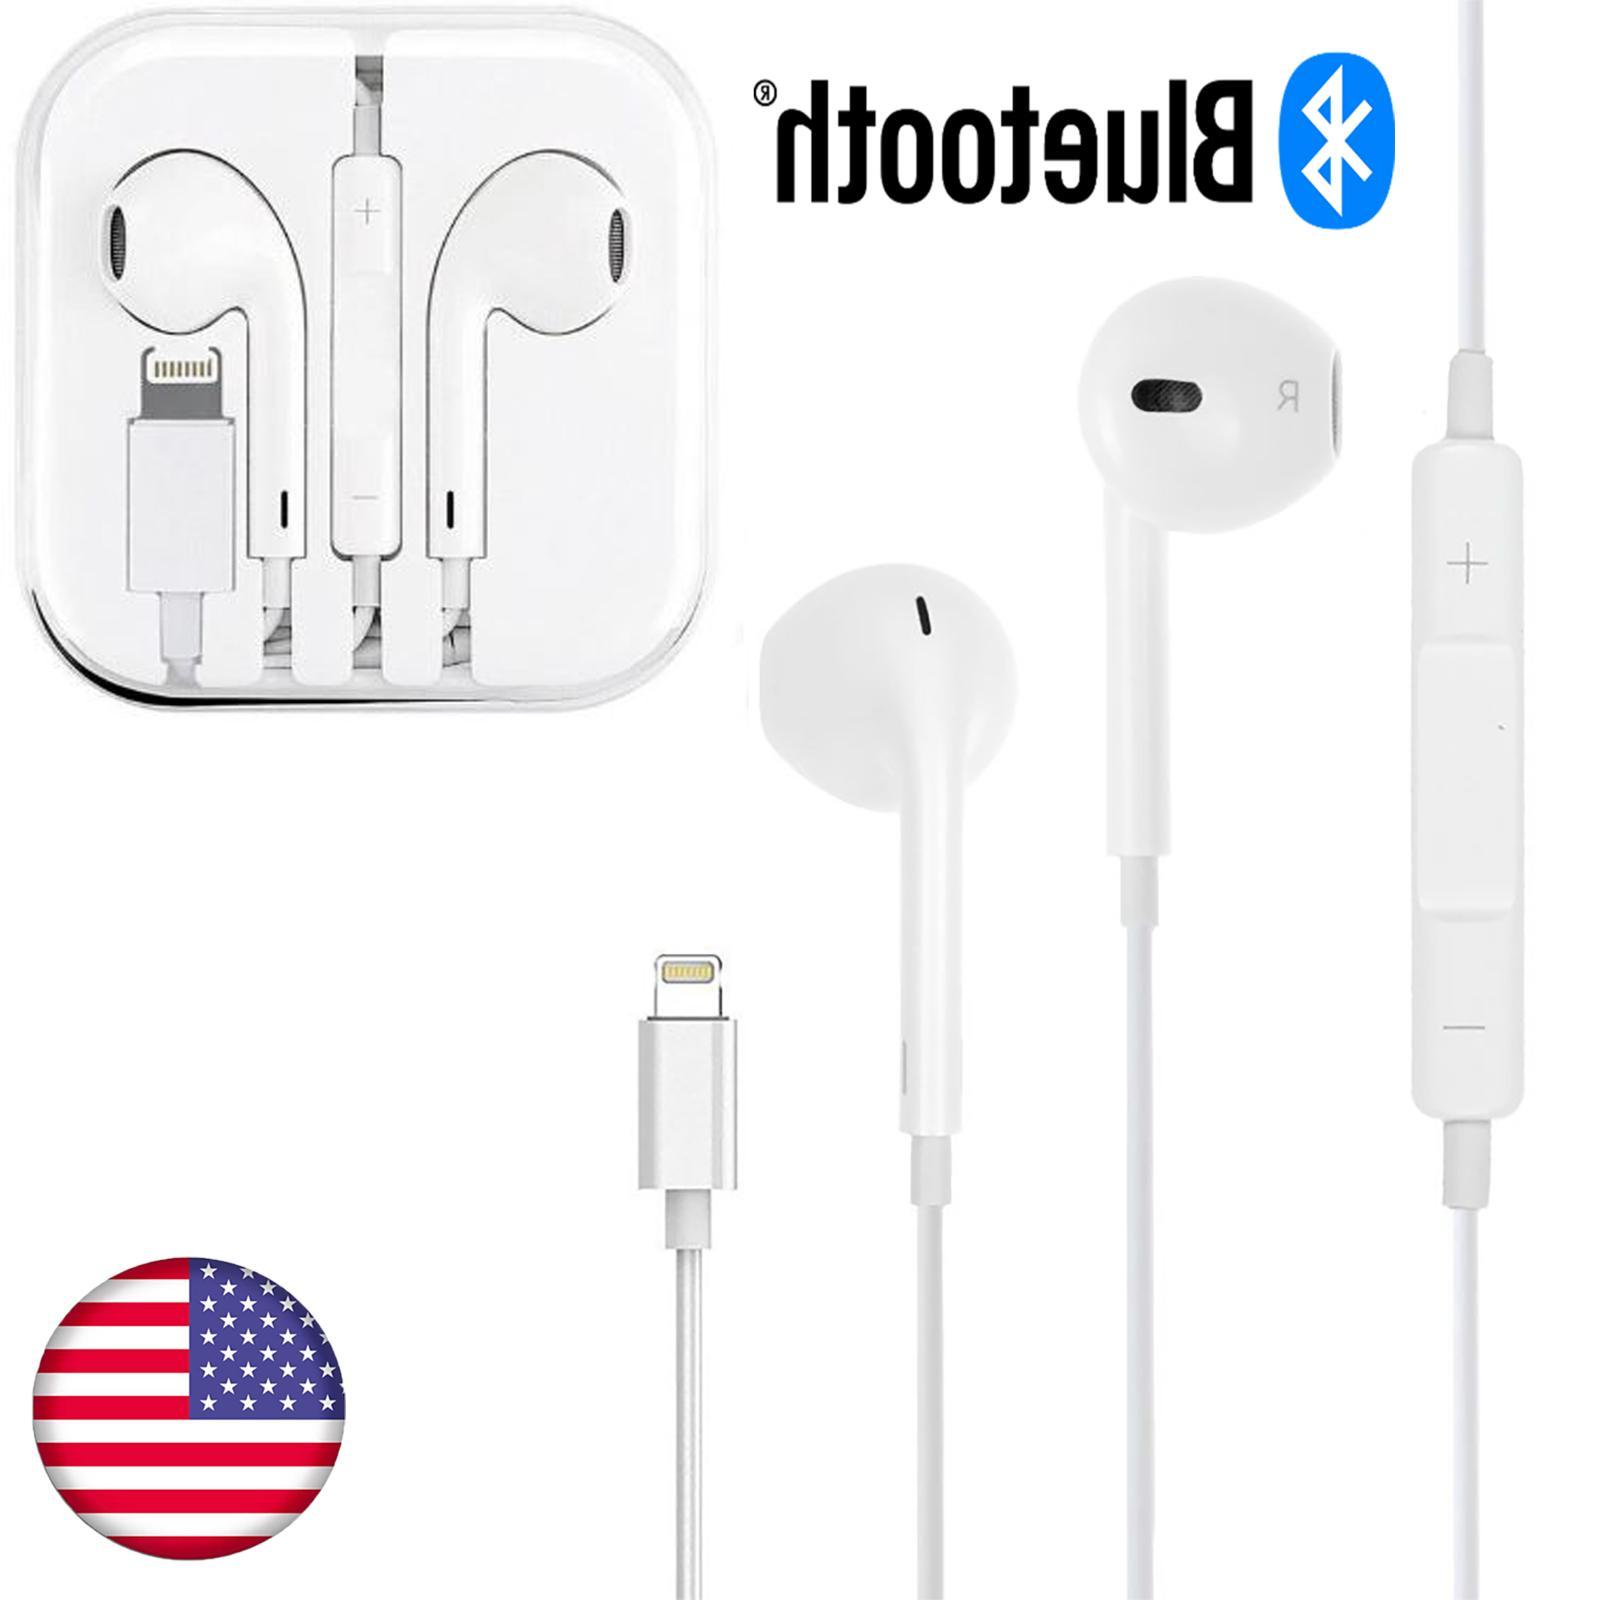 oem quality headphones bluetooth earbuds headsets